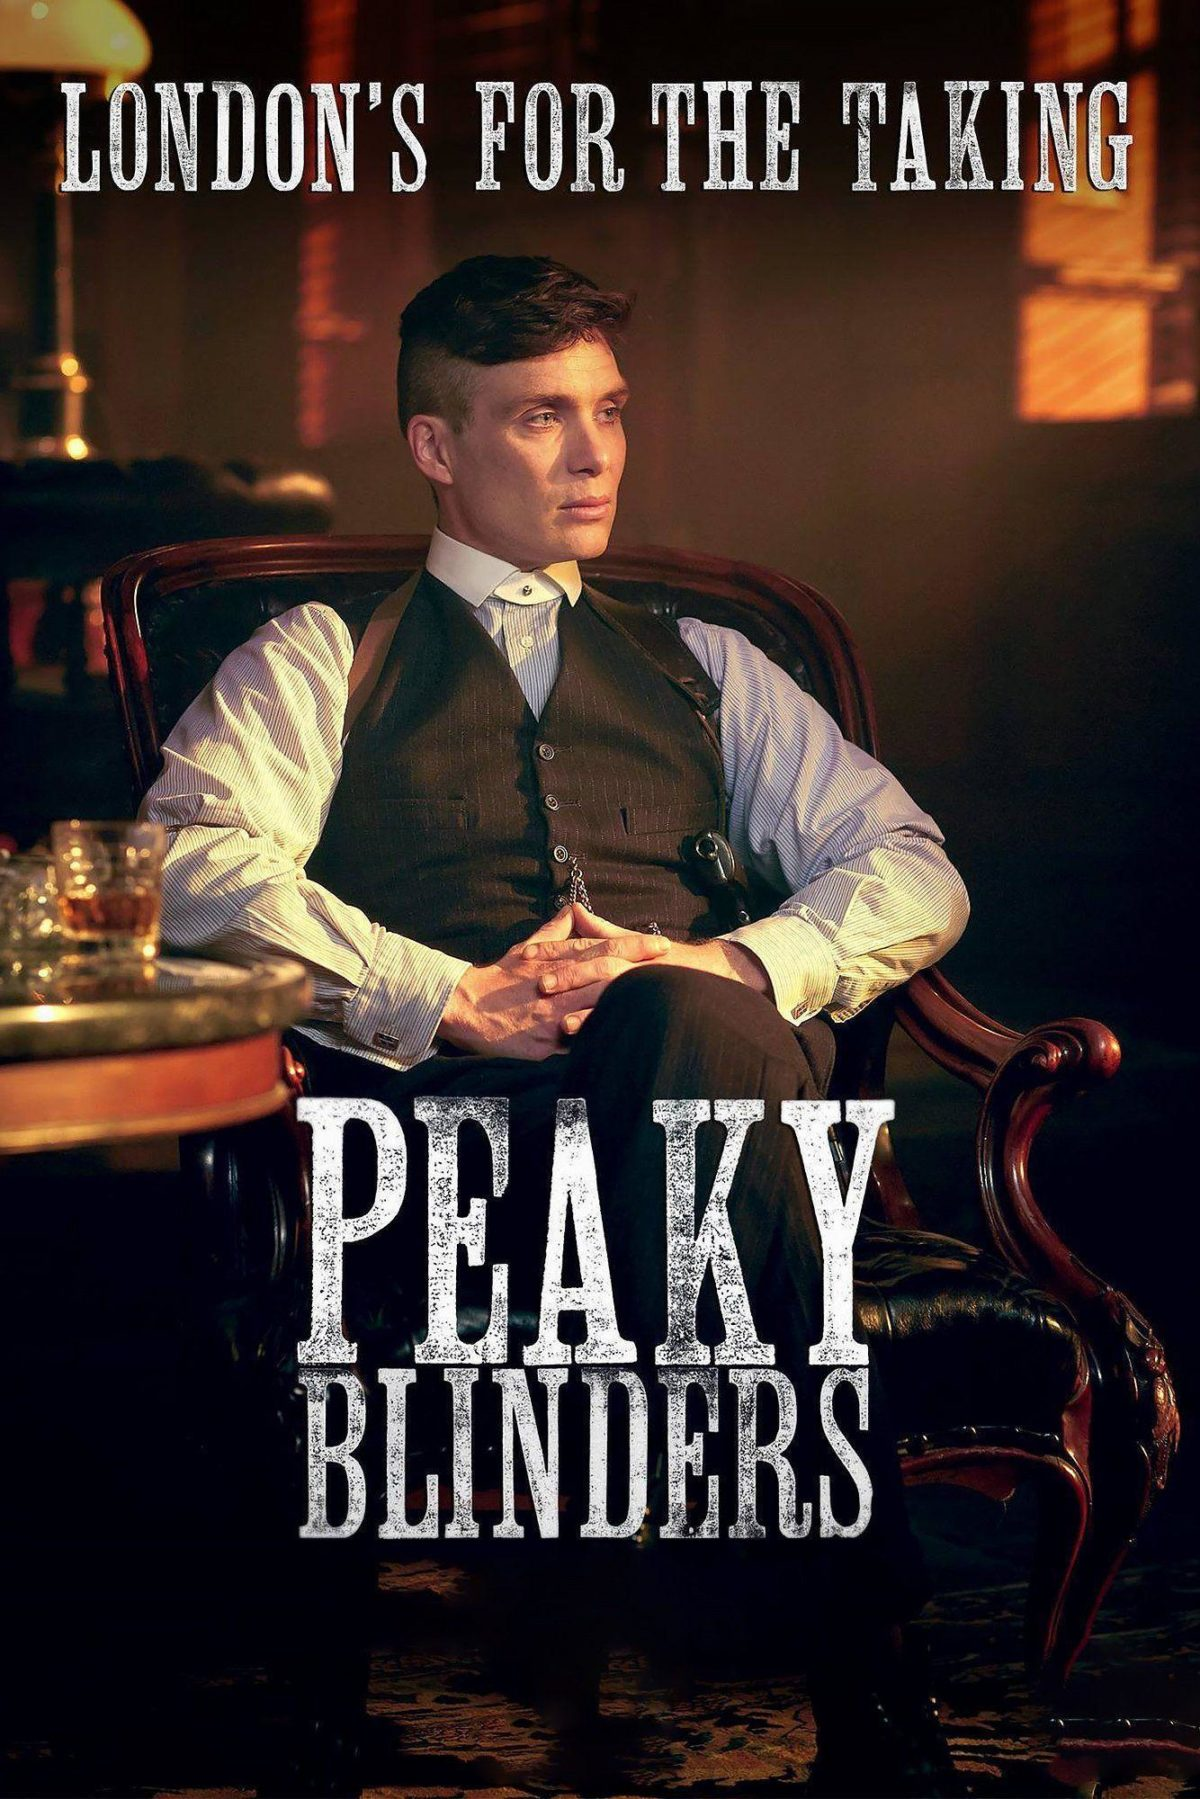 Peaky Blinders Wallpapers for Iphone 7, Iphone 7 plus, Iphone 6 plus